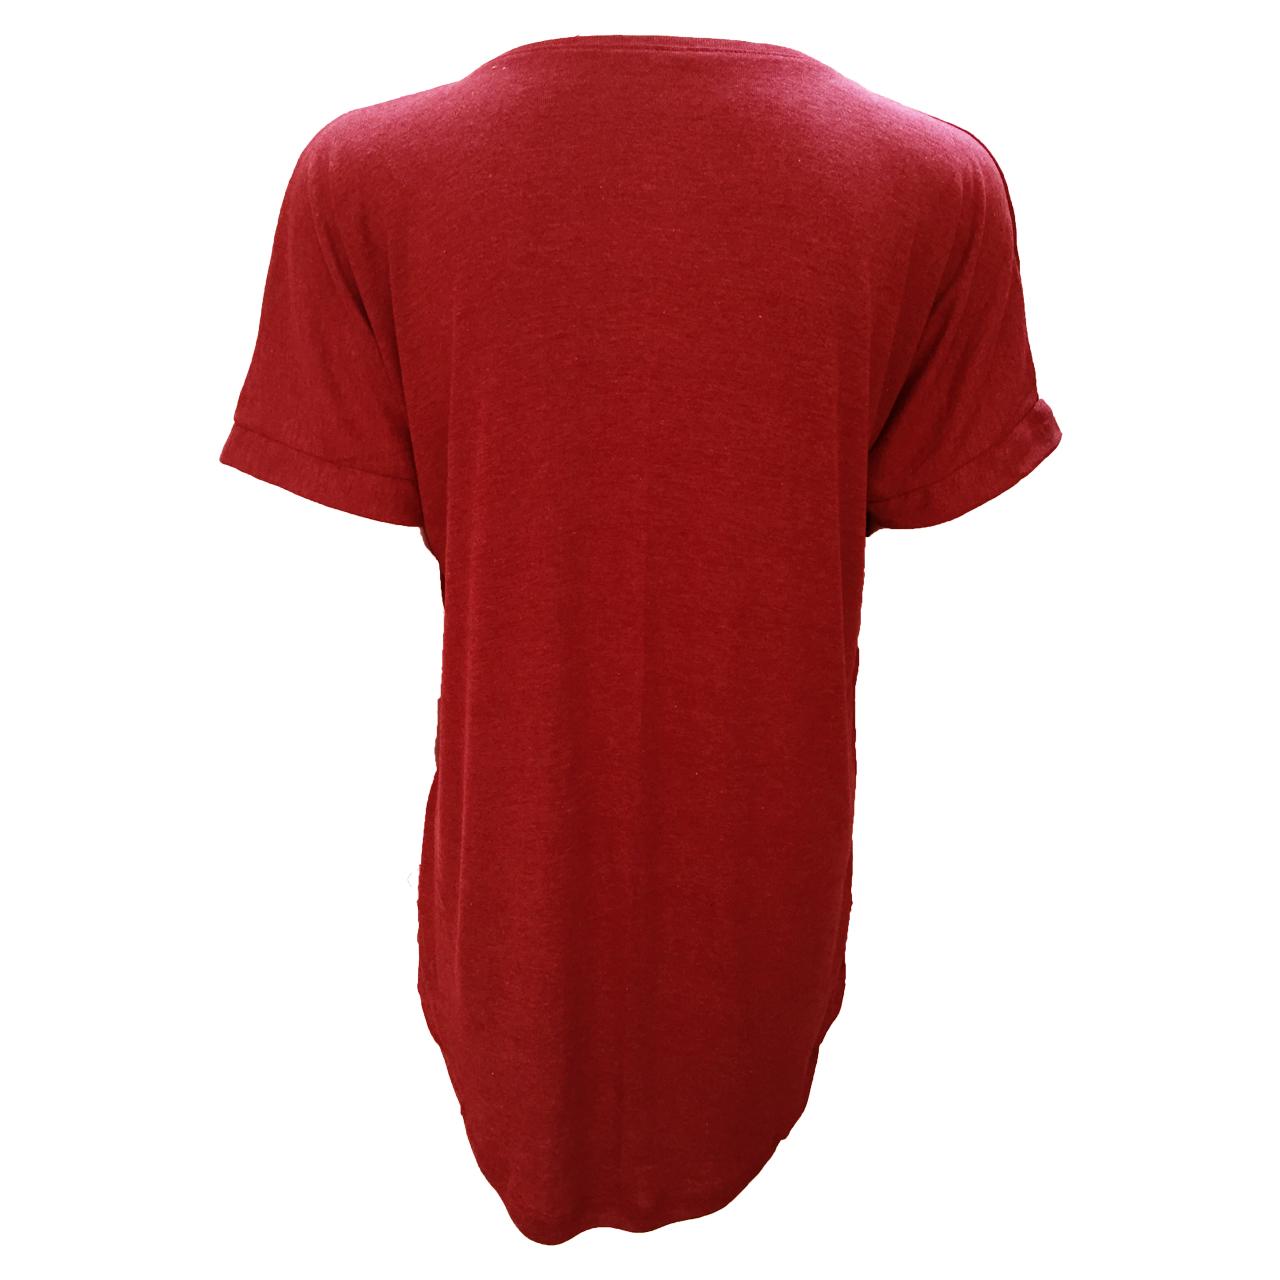 تی شرت آستین کوتاه زنانه مدل WATERFALL کد tms-859